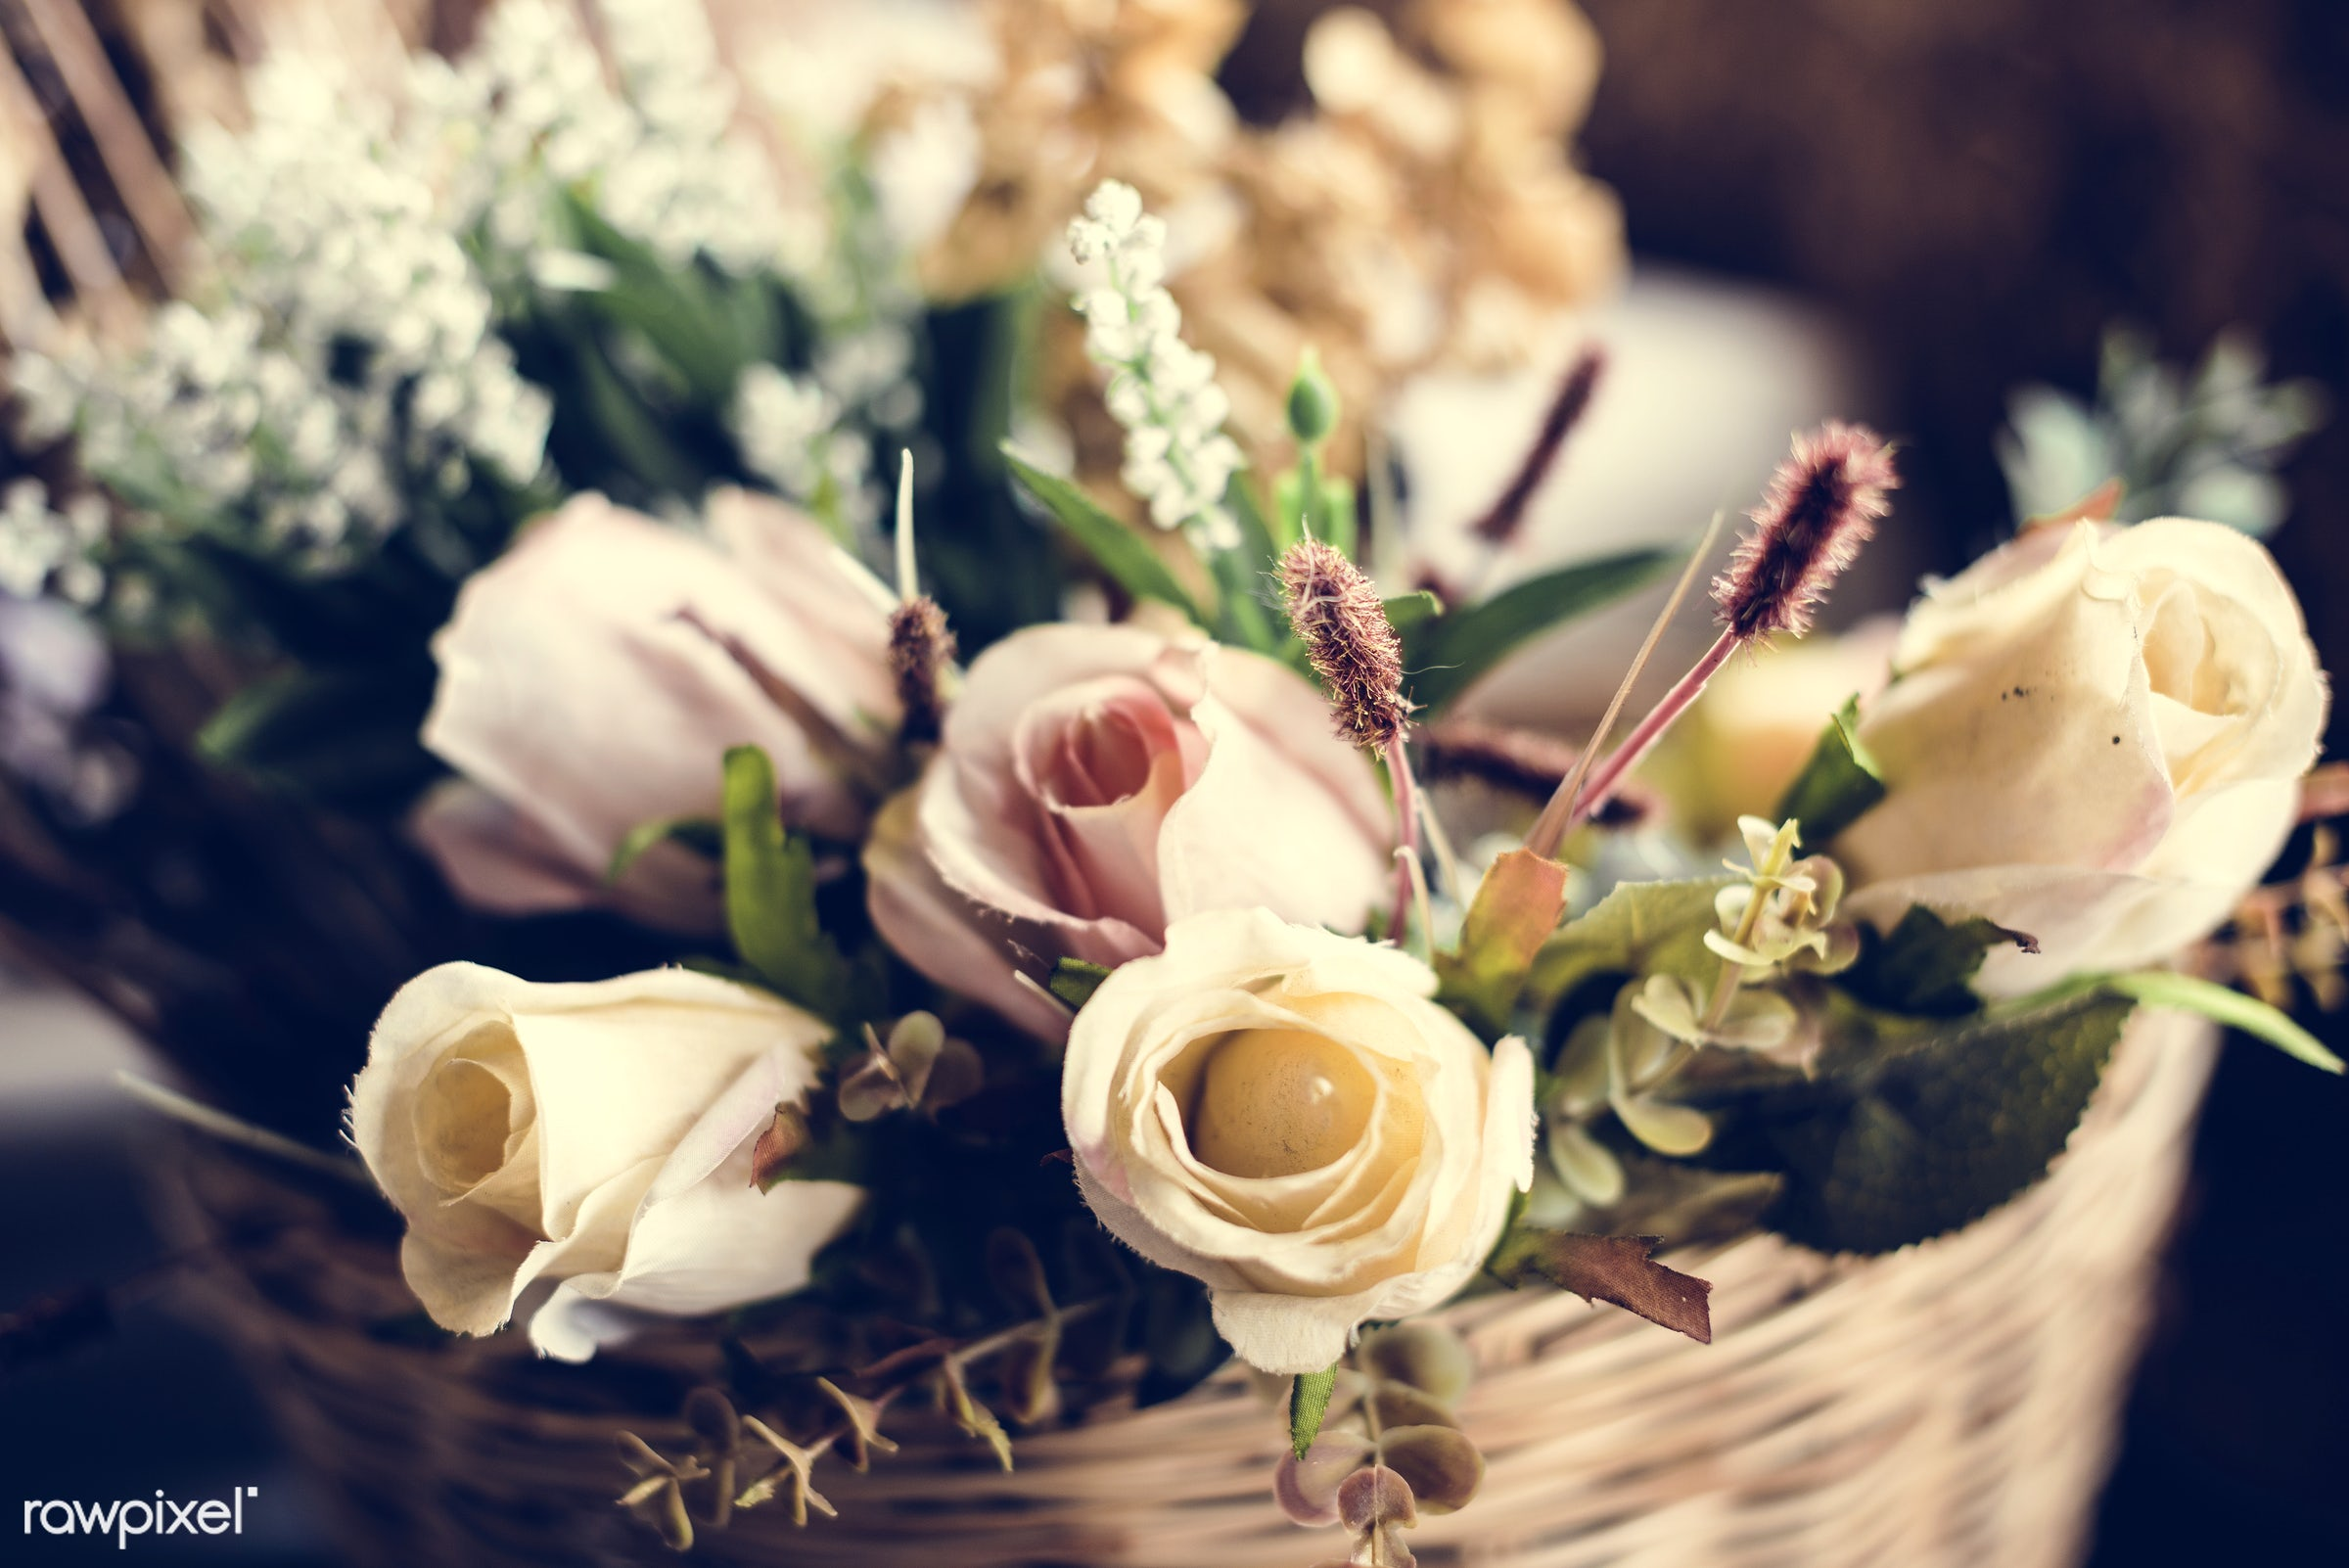 festive, nobody, shop, detail, decorative, colorful, plants, spring, blossom, decor, nature, fresh, attractive, making,...